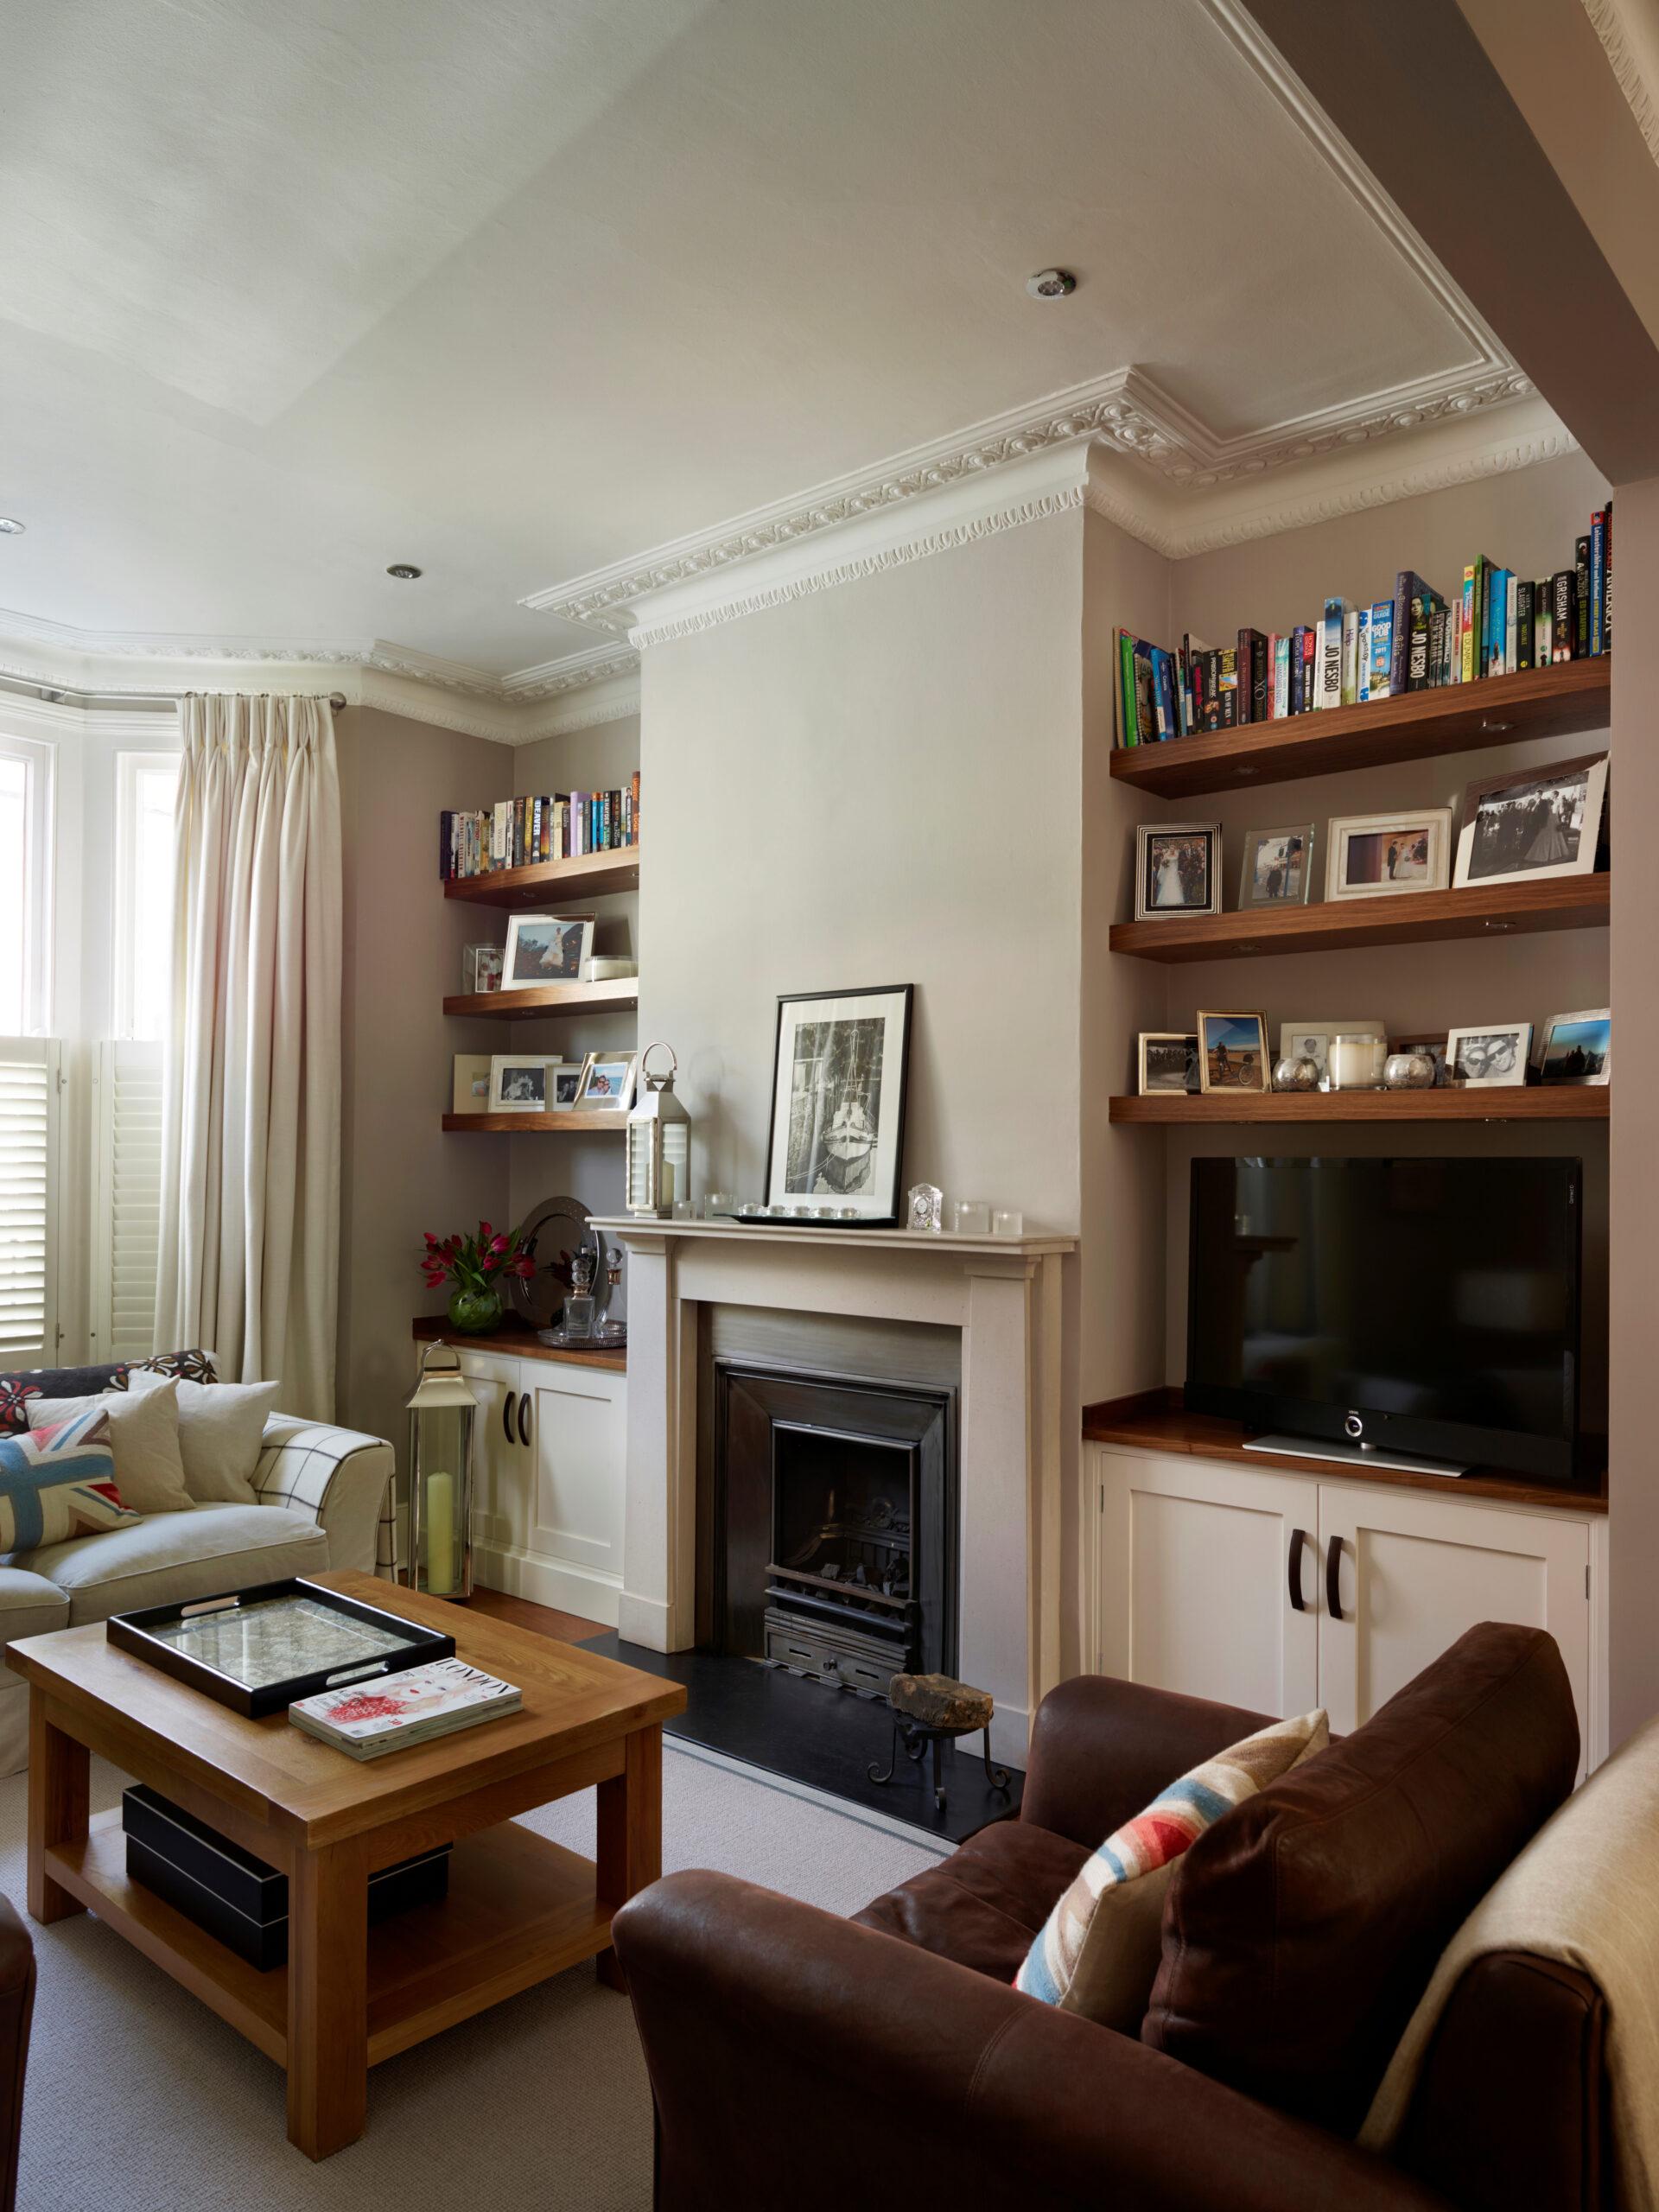 Bookshelves - Fulham Project